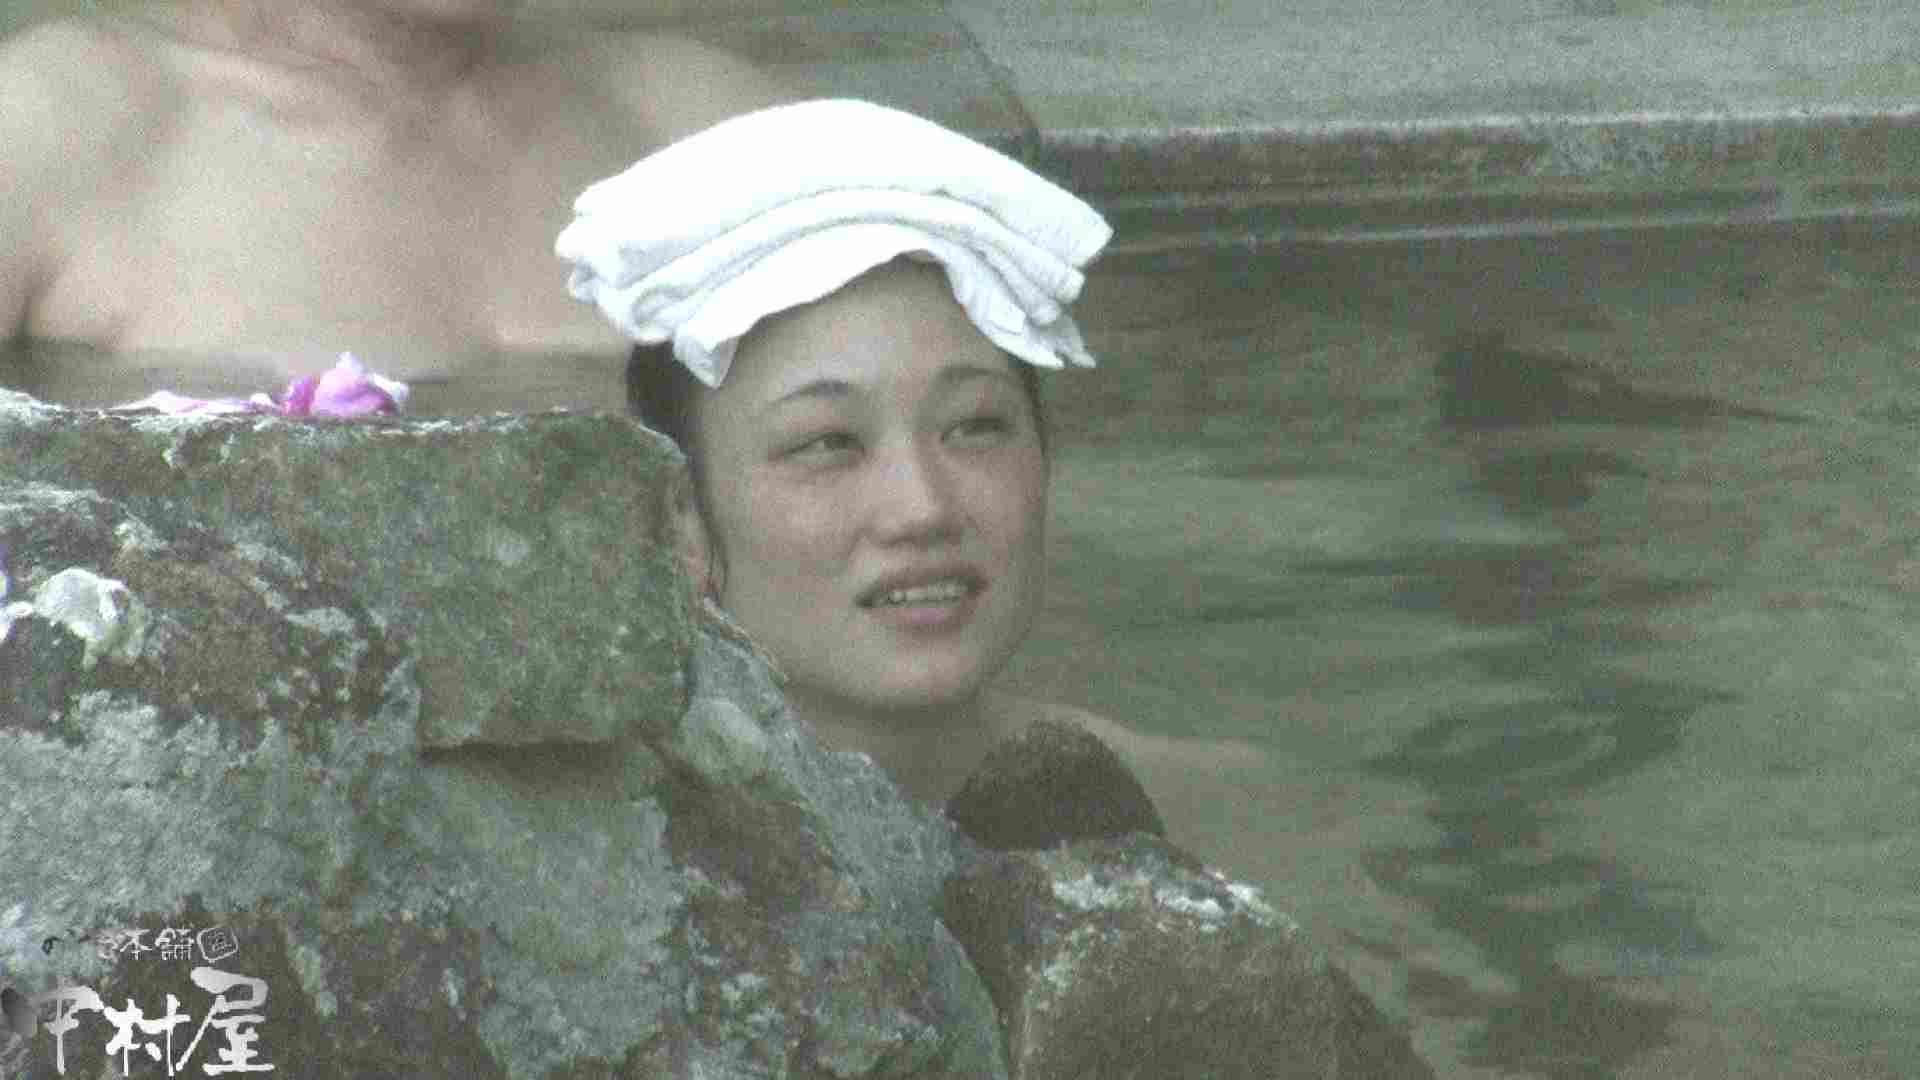 Aquaな露天風呂Vol.914 露天風呂編  83PIX 30